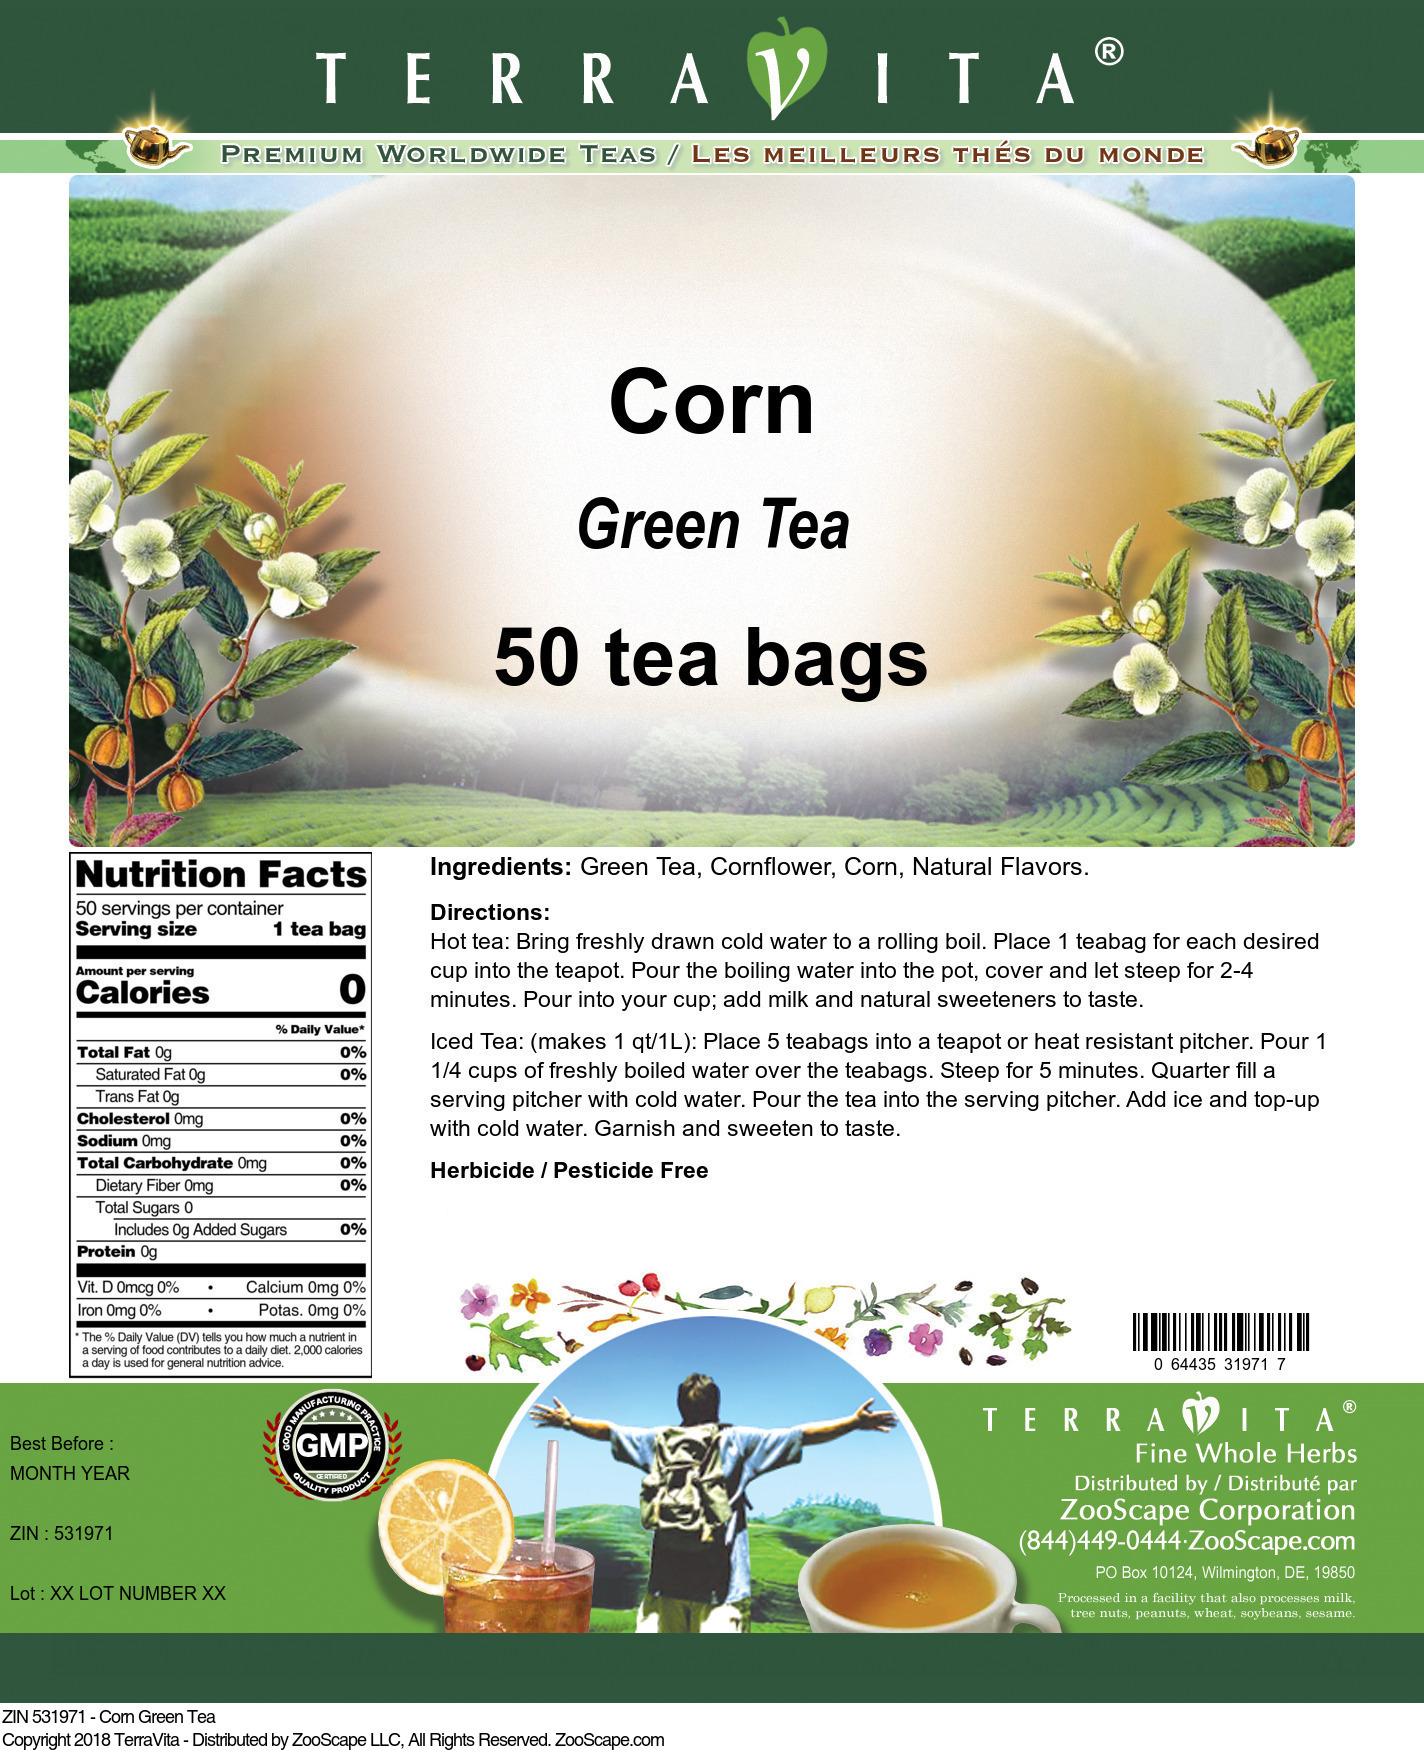 Corn Green Tea